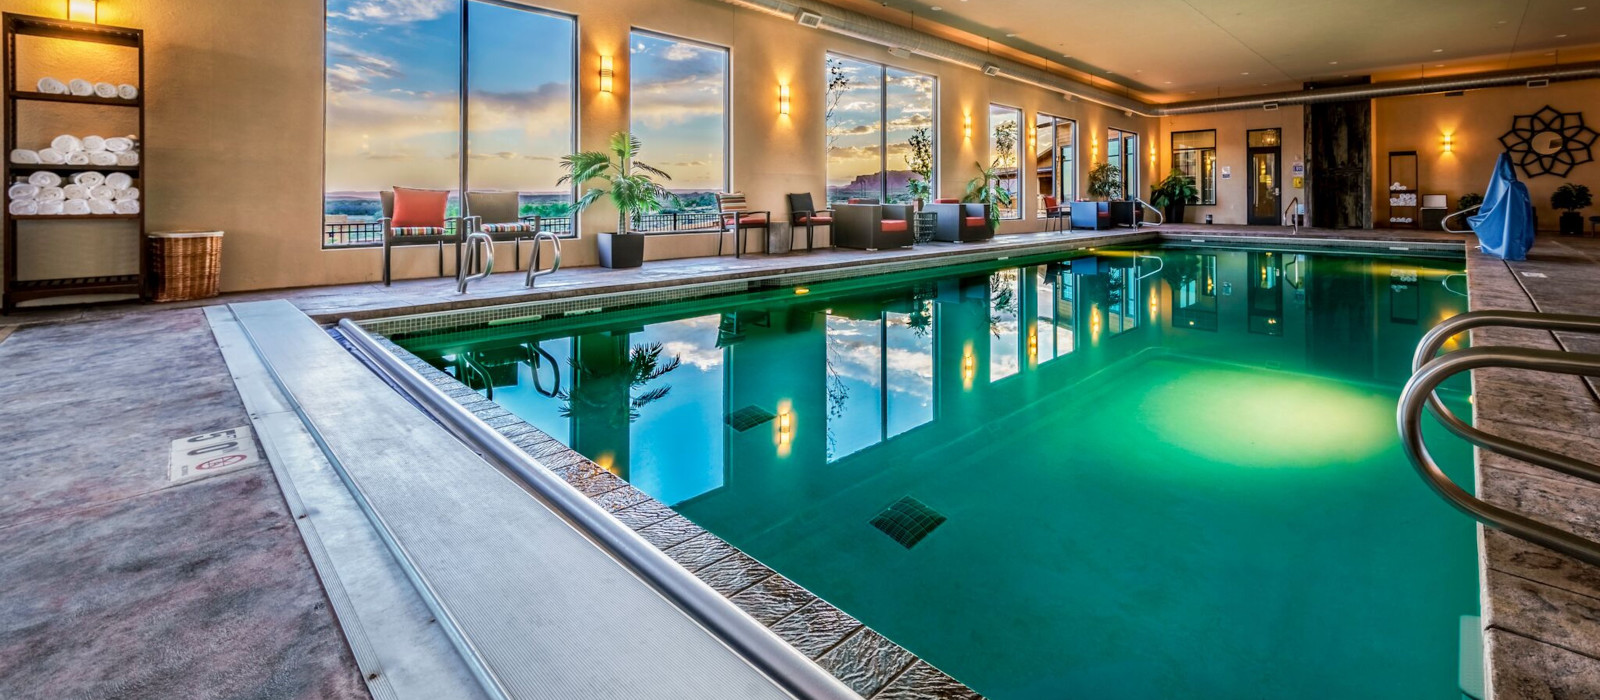 Hotel Desert Rose Resort and Cabins USA